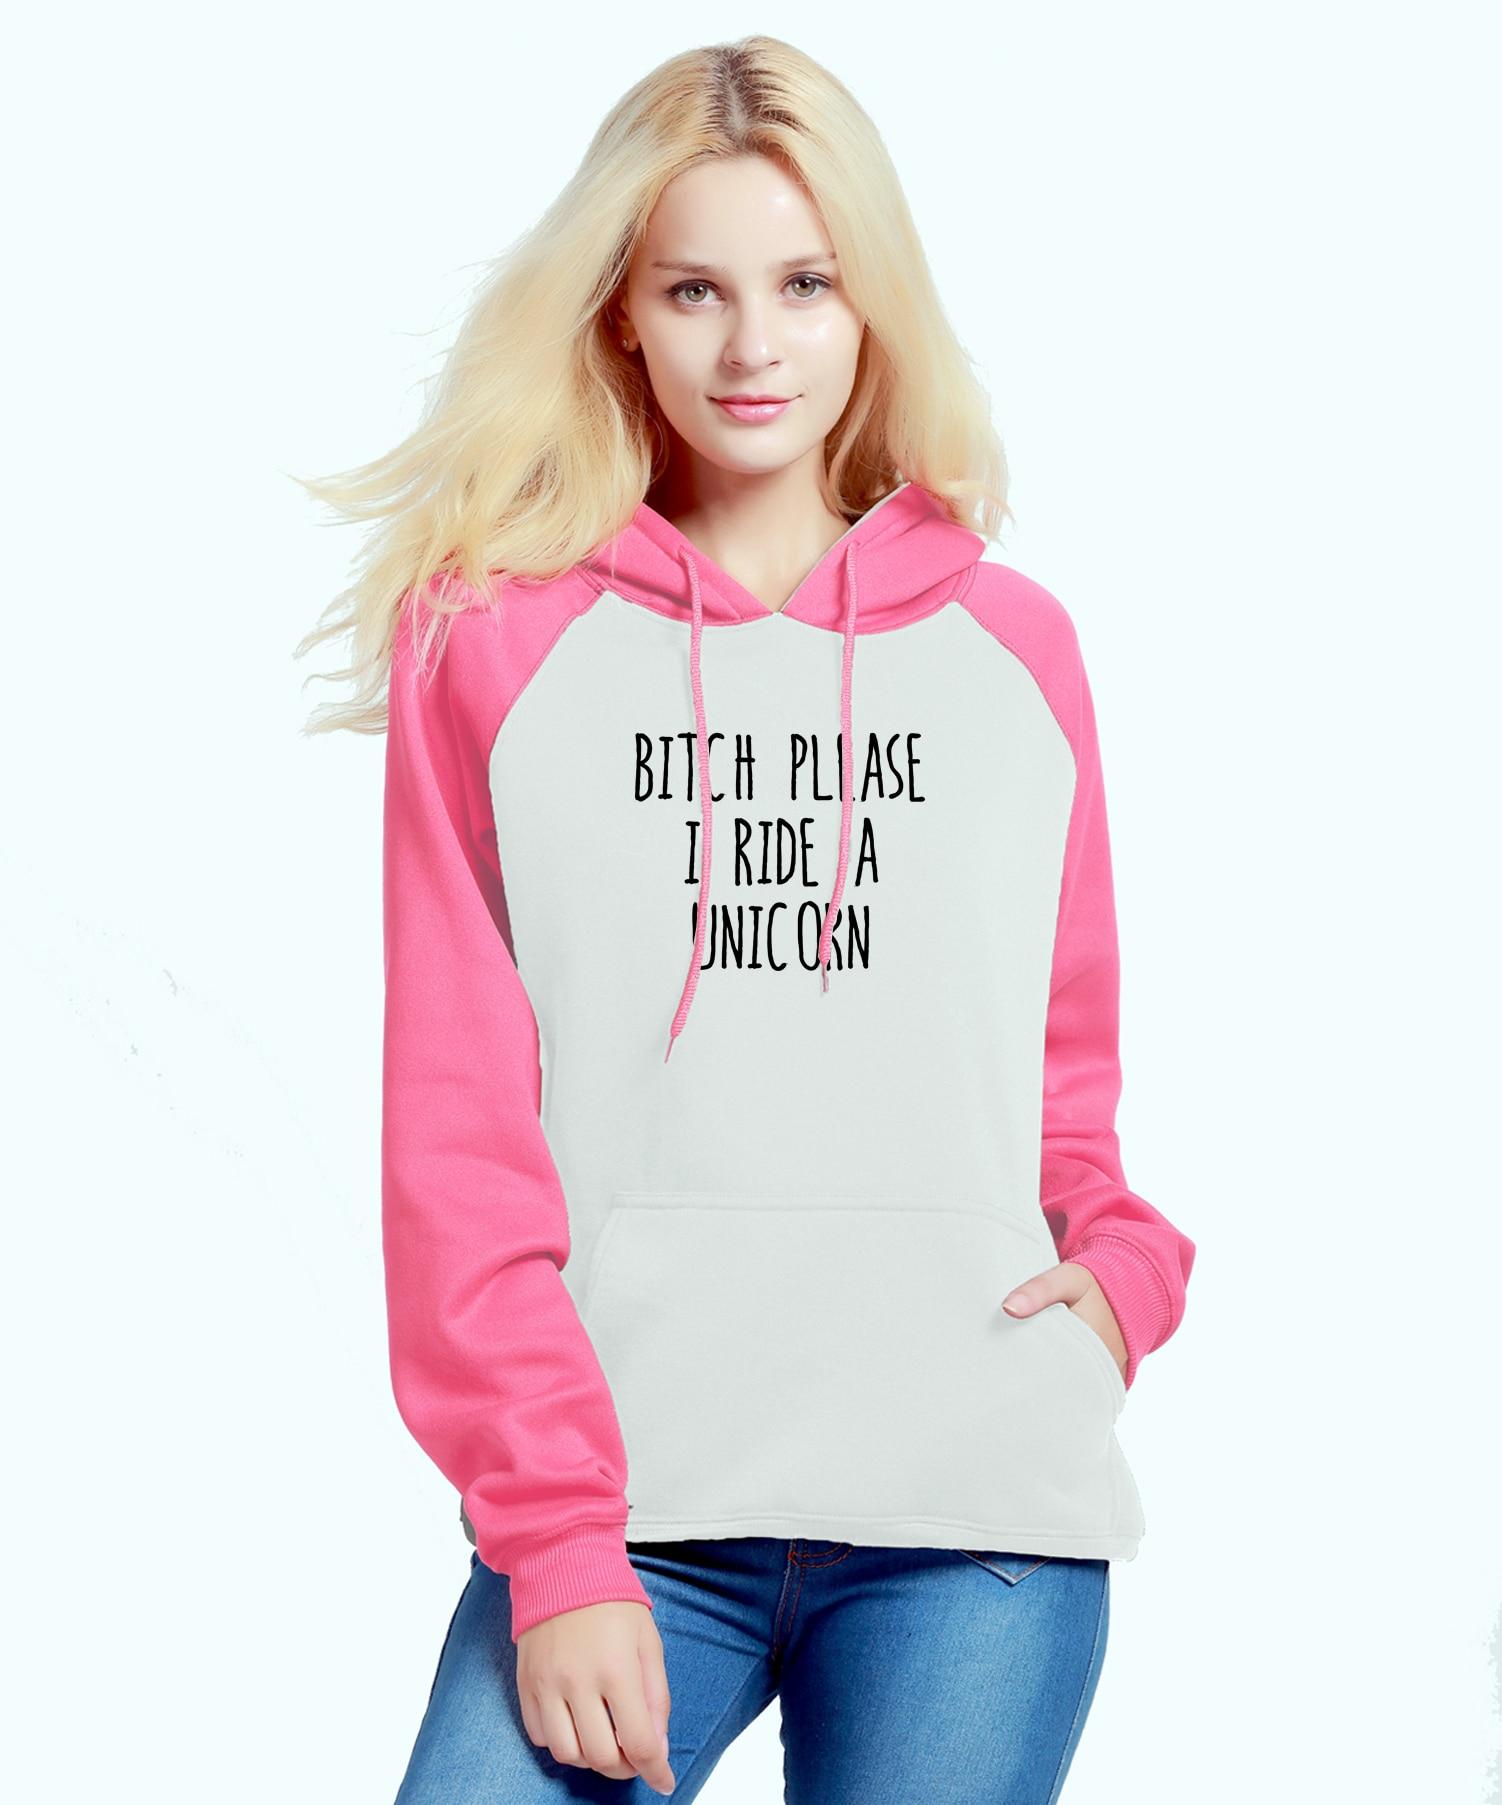 New Fashion Women's Sportswear Pink Kawaii Hoody 2019 Autumn Winter Raglan Sweatshirt Print BITCH PLEASE I RIDE A UNICORN Hoodie